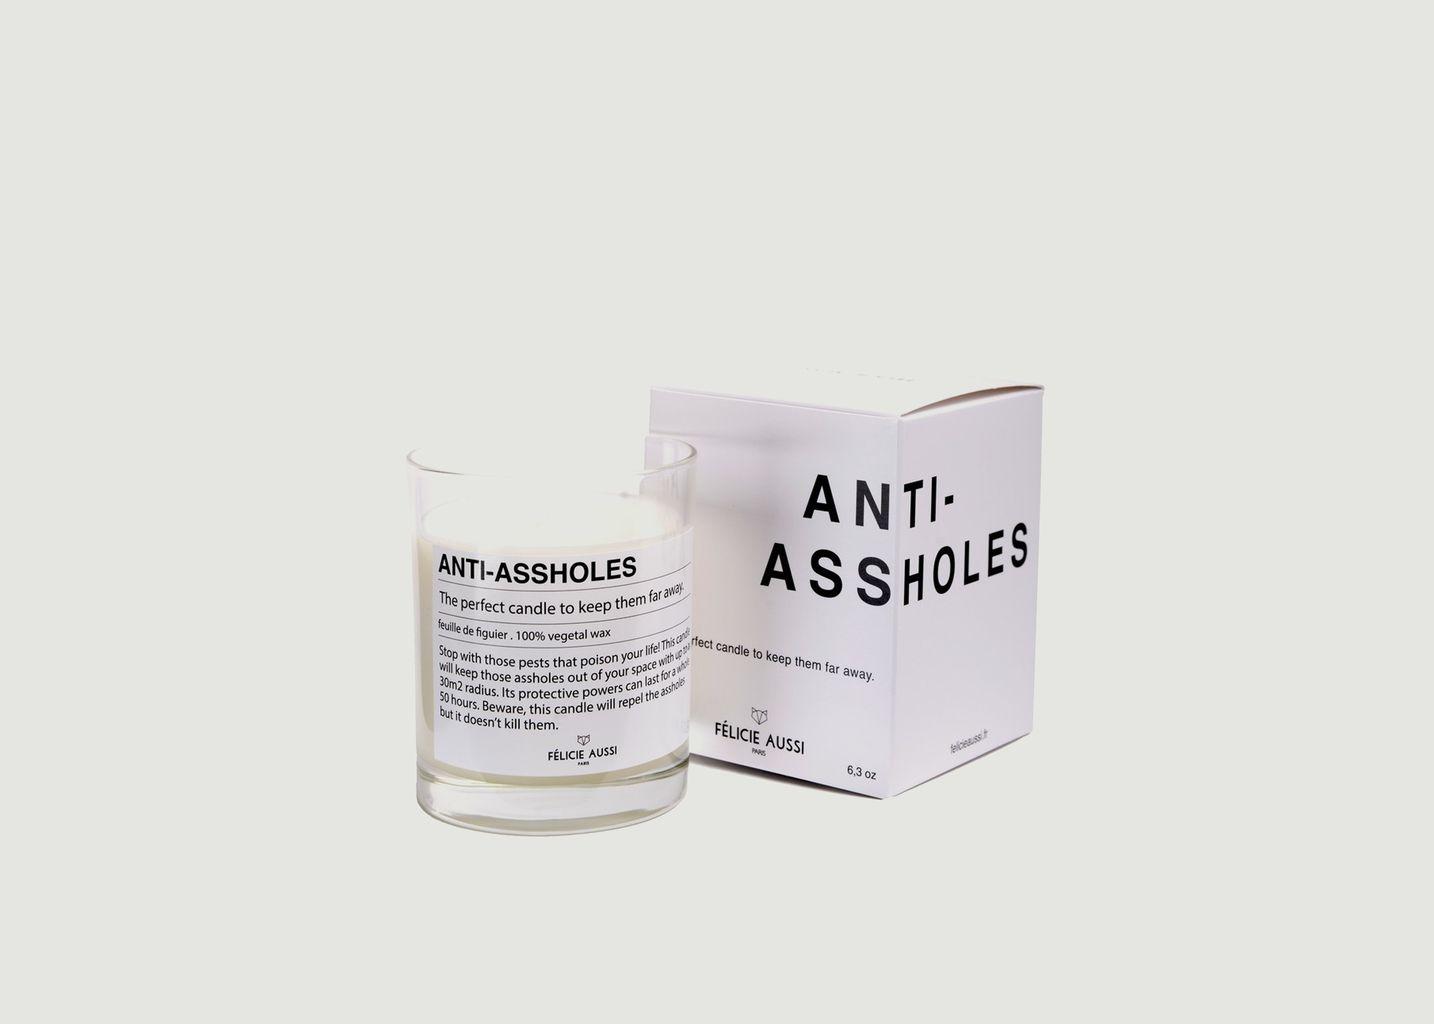 Bougie Anti-assholes - Felicie Aussi